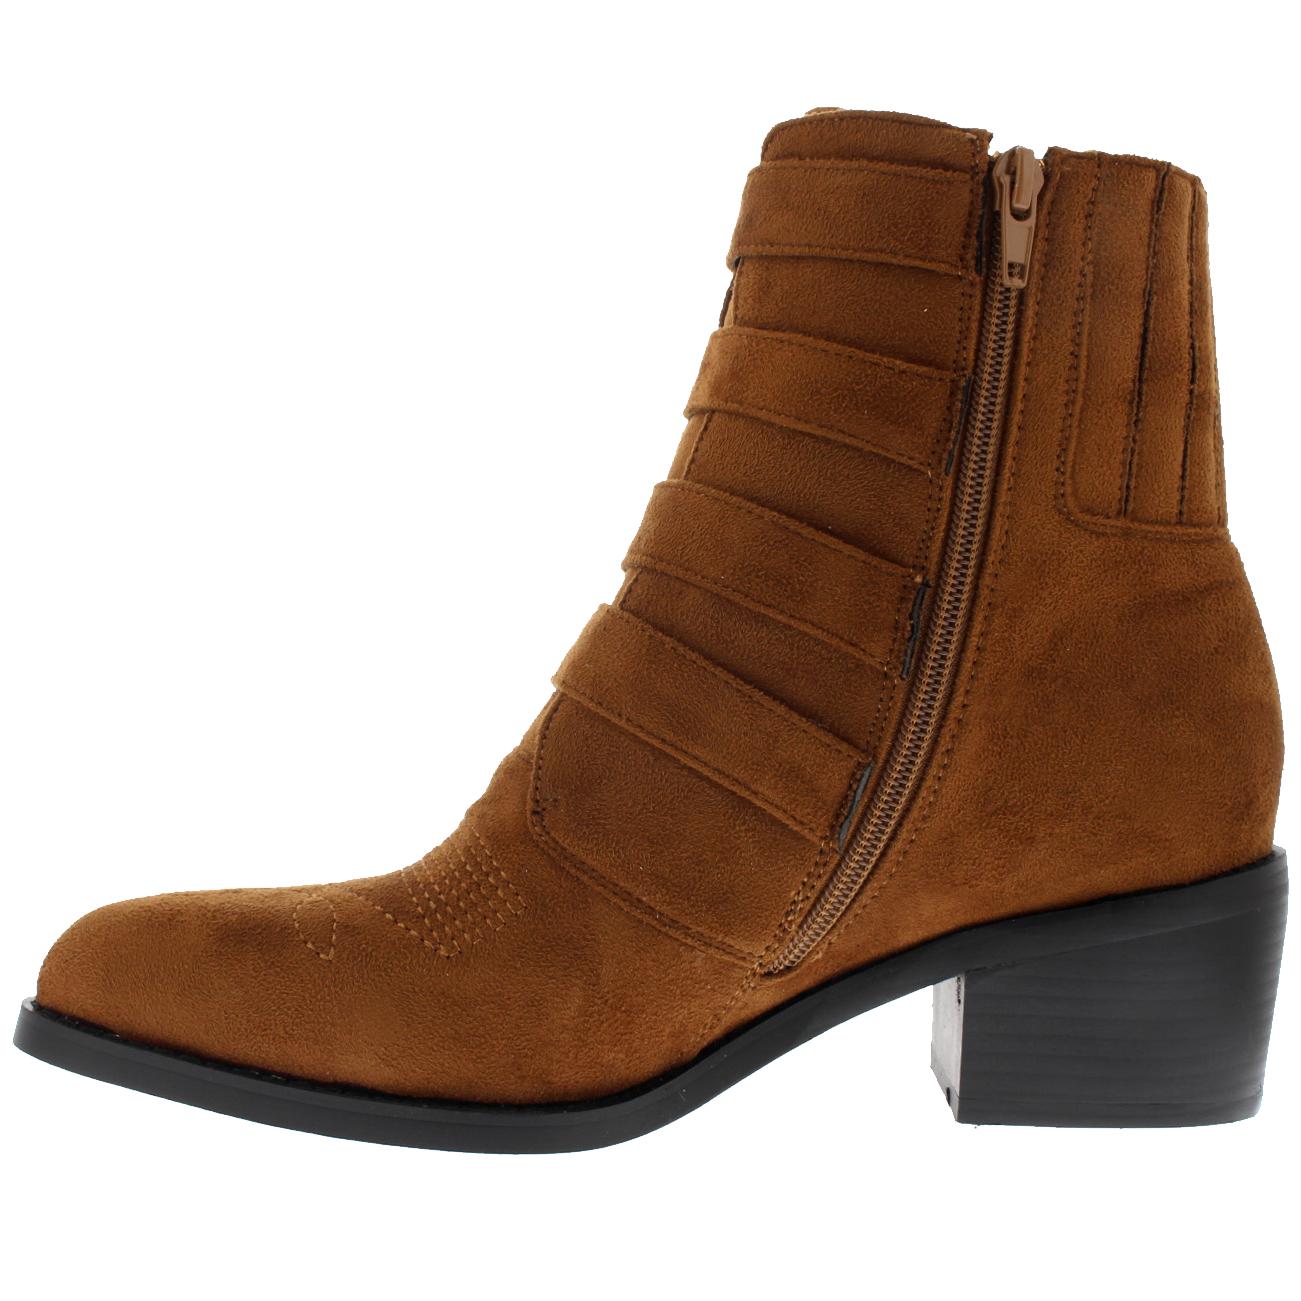 Ladies Rock Western Biker Chic Combat Cowboy Block Heel Ankle Boots All Sizes